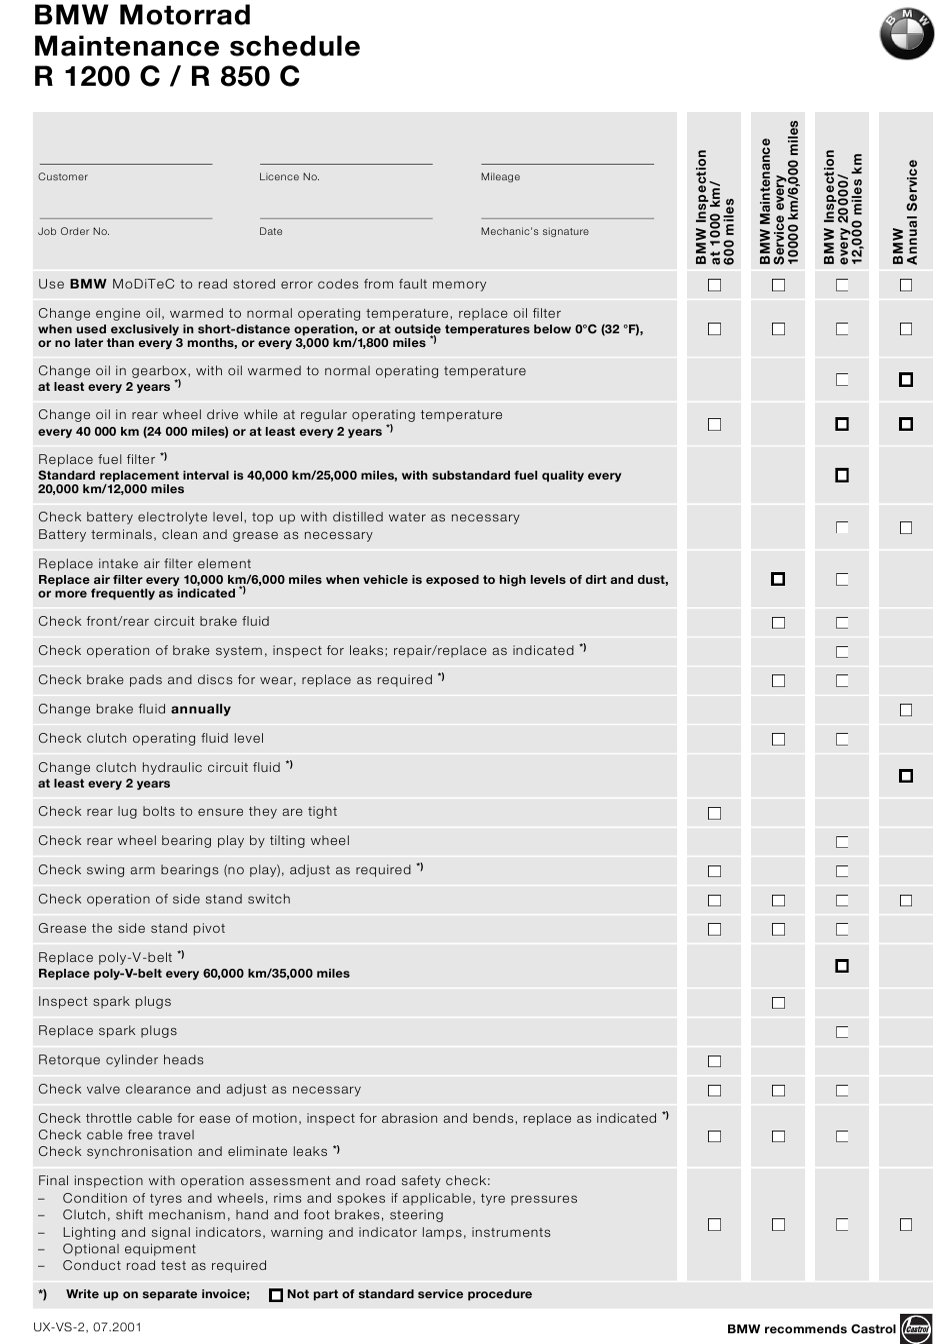 Maintenance Schedule Template For R 1200 C R 850 C Bmw Models Bmw Motorrad Download Printable Pdf Templateroller